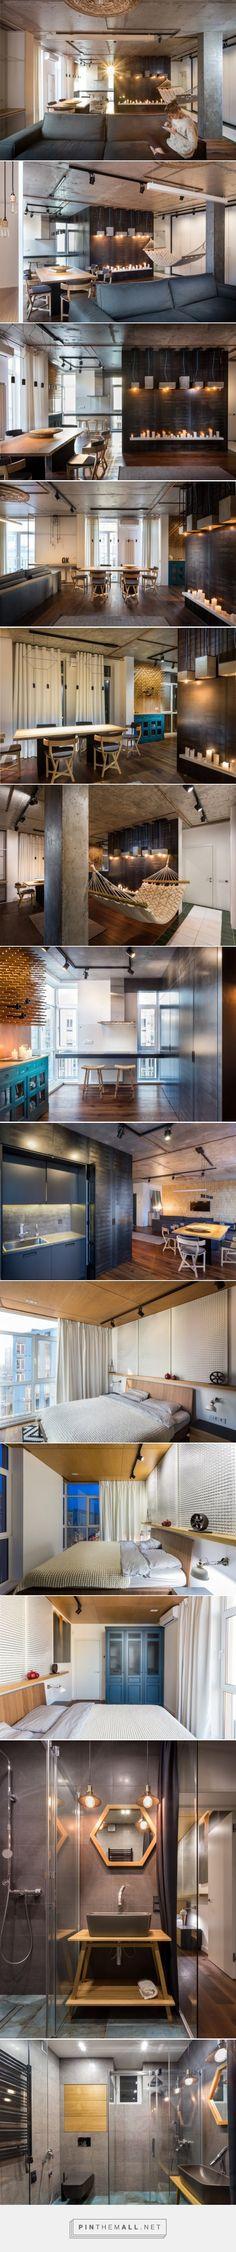 True Apartment by Svoya Studio   HomeAdore - created via https://pinthemall.net